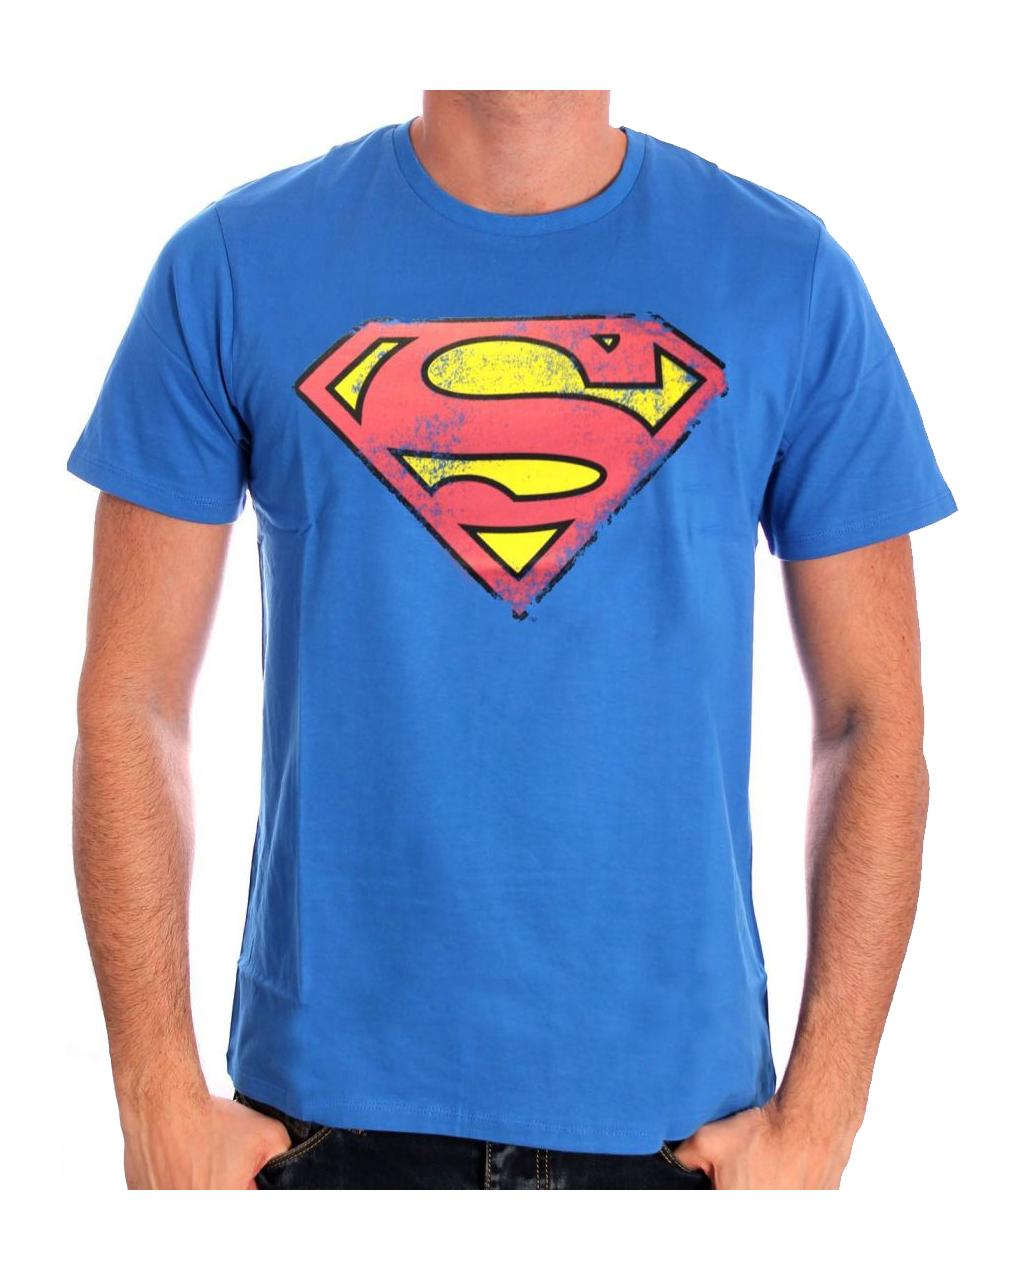 Superman Retro Logo T Shirt Superhero T Shirt Retro Look Horror